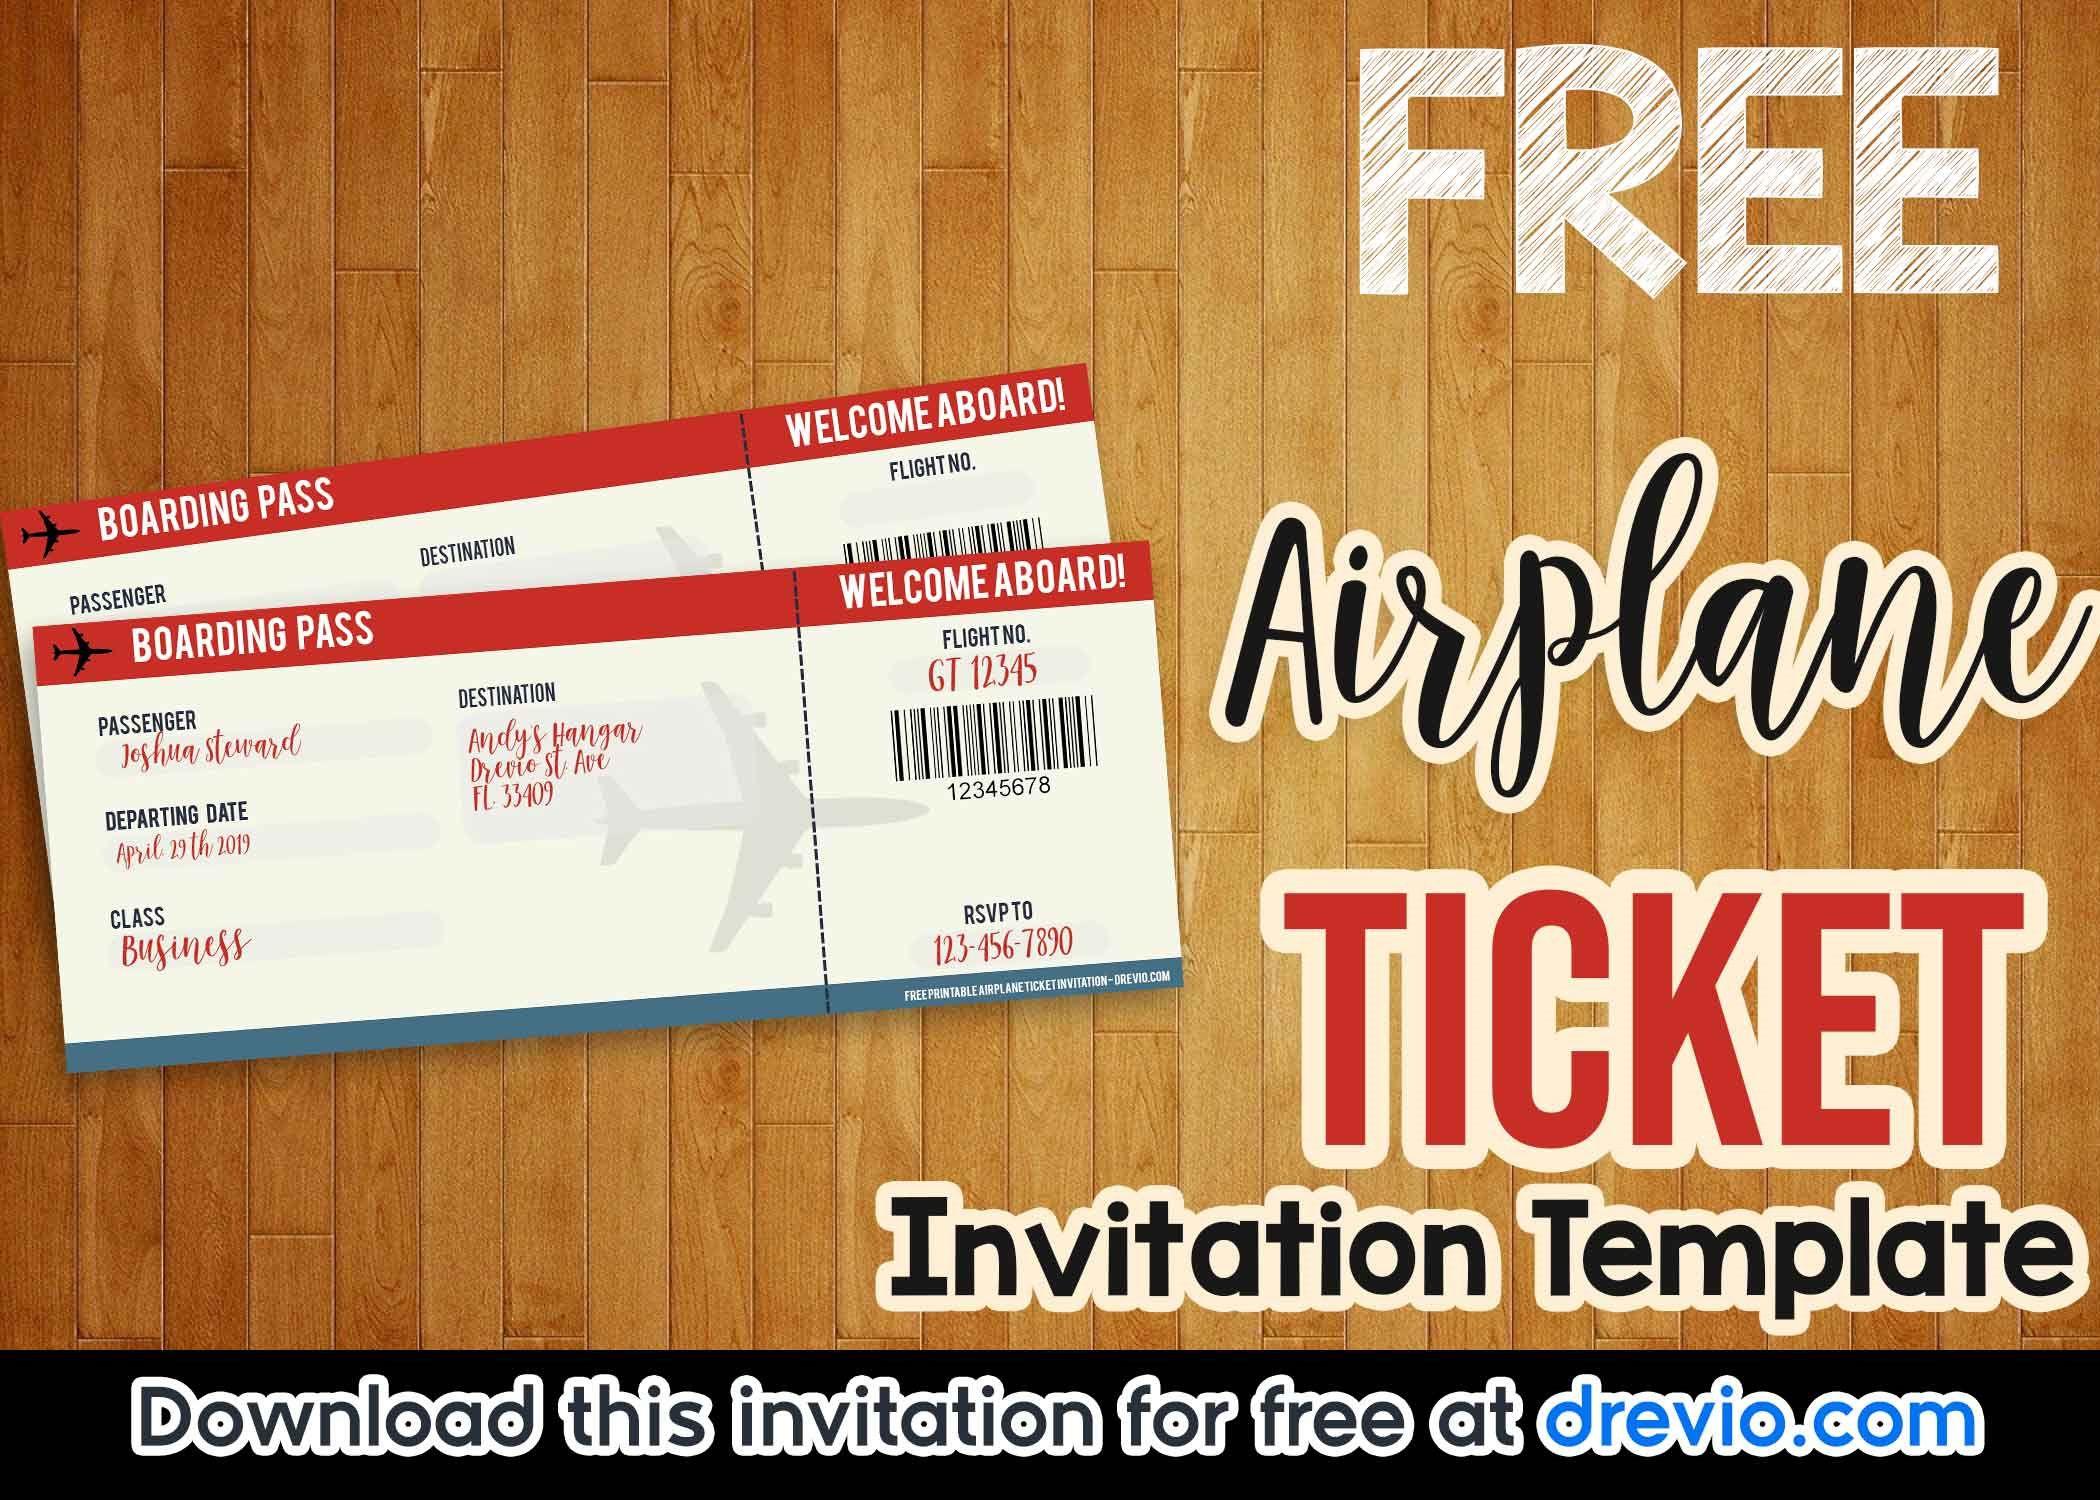 005 Exceptional Ticket Invitation